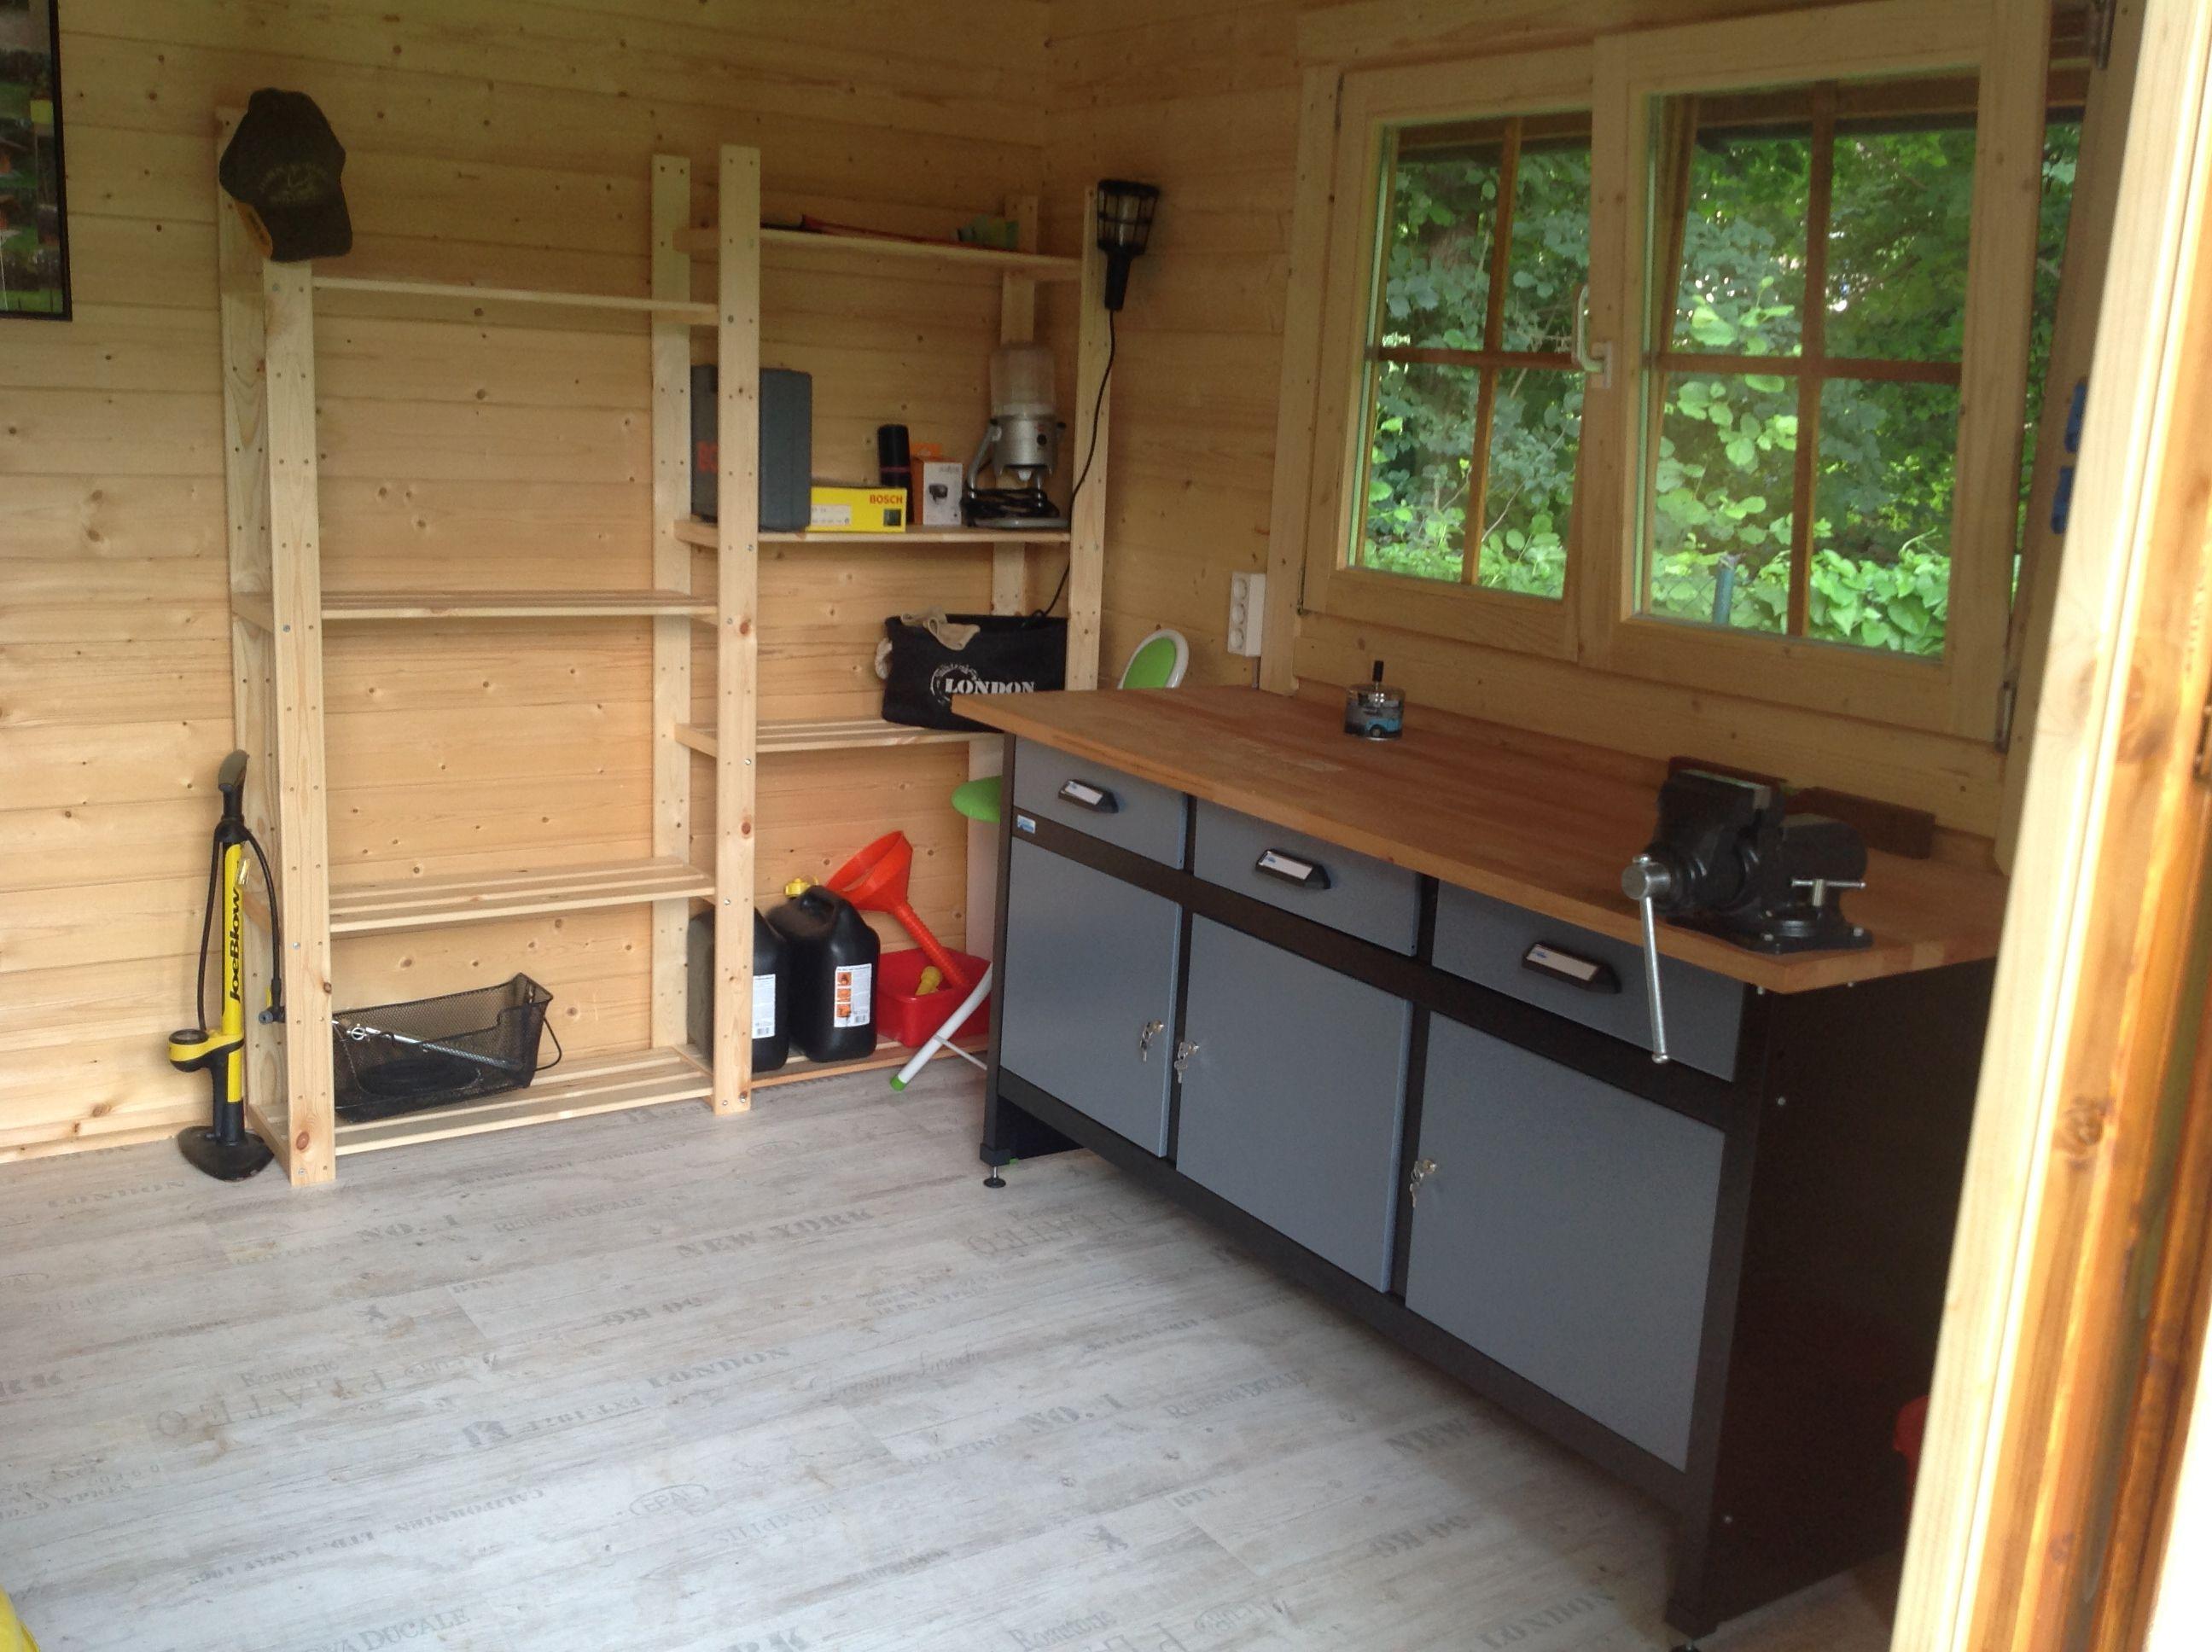 Fensterrahmen Aus Holz Selbst De In 2021 Gartenhaus Bauen Gartenhaus Selber Bauen Schuppen Selber Bauen